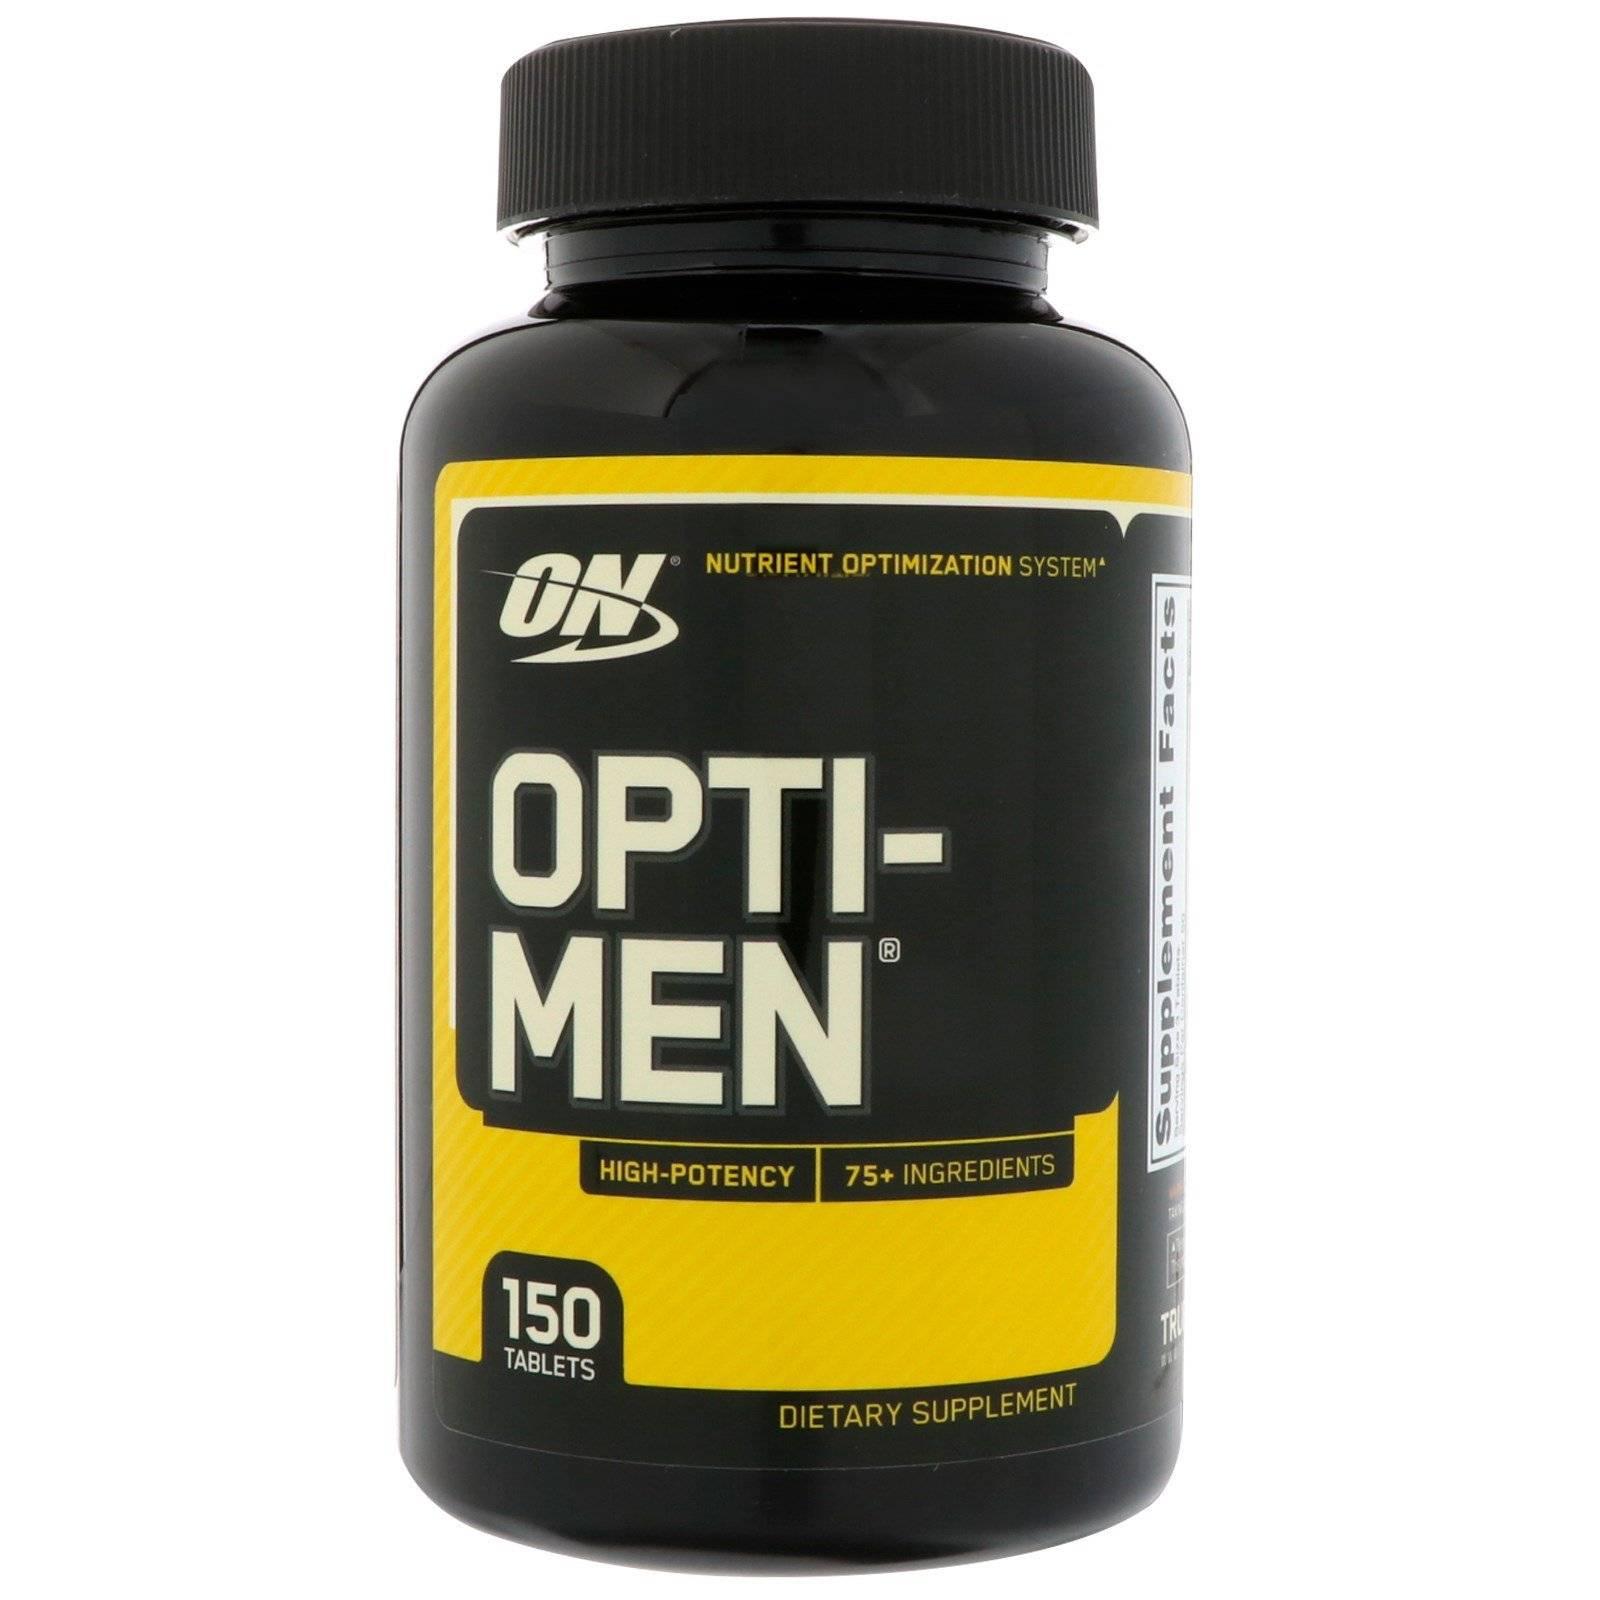 Opti - women 120 капс (optimum nutrition)